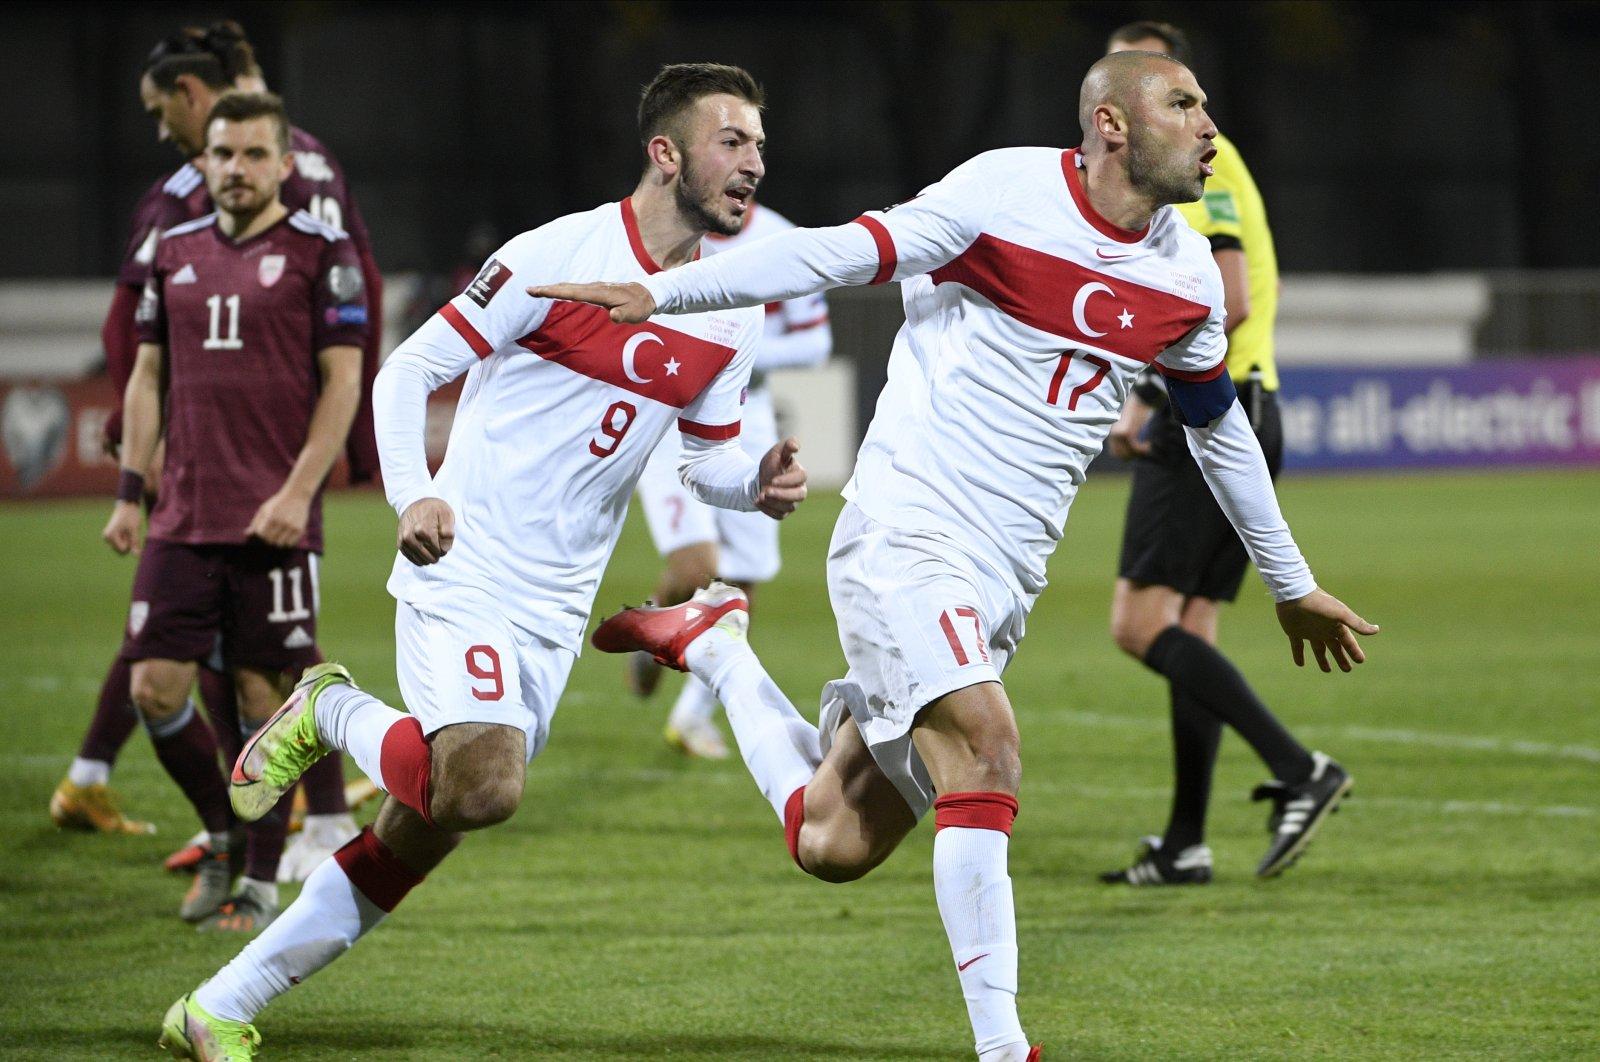 Turkey's Burak Yılmaz (R) celebrates a goal during the FIFA World Cup Qatar 2022 Group G qualifying football match between Latvia and Turkey at the Daugava Stadium in Riga, Latvia, Oct. 11, 2021. (AP Photo)